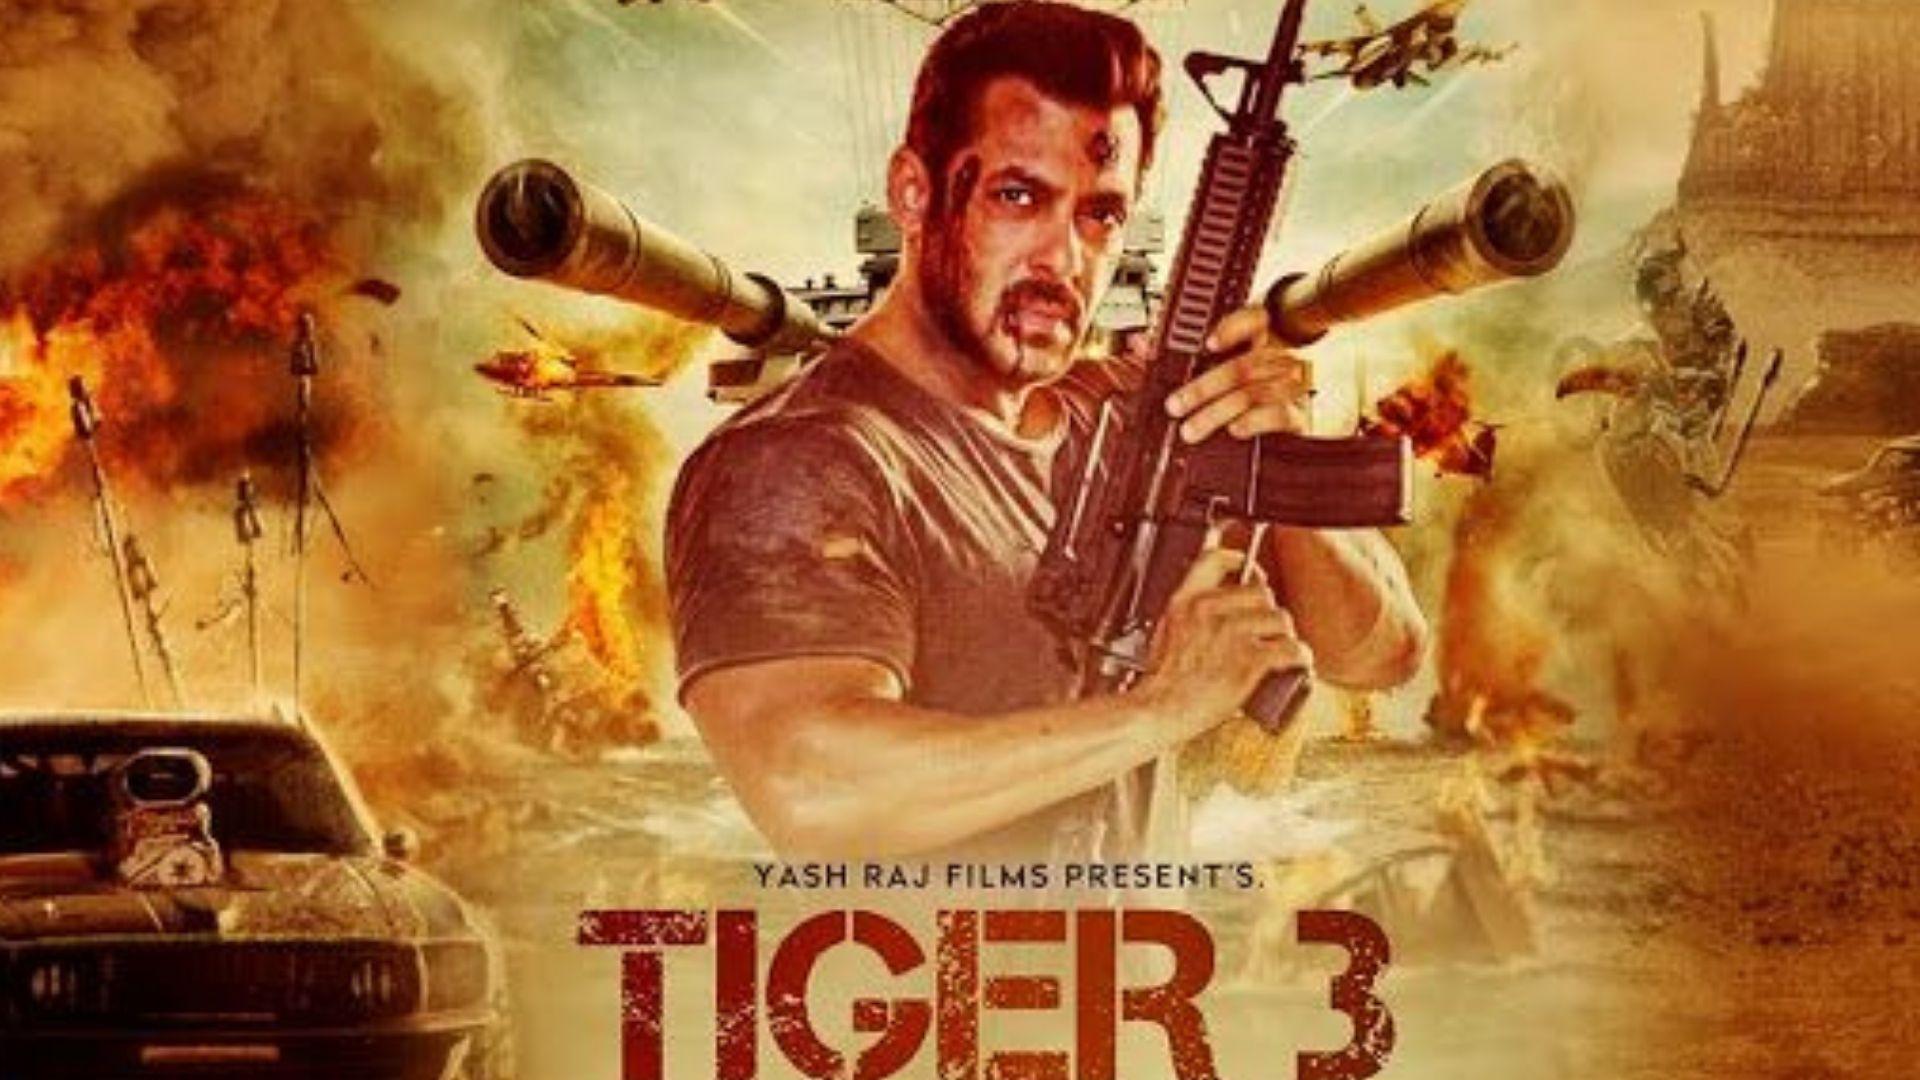 Tiger 3: Salman Khan To Finish Shoot By November End; Actor To Then Begin Shooting For Godfather And Kabhi Eid Kabhi Diwali